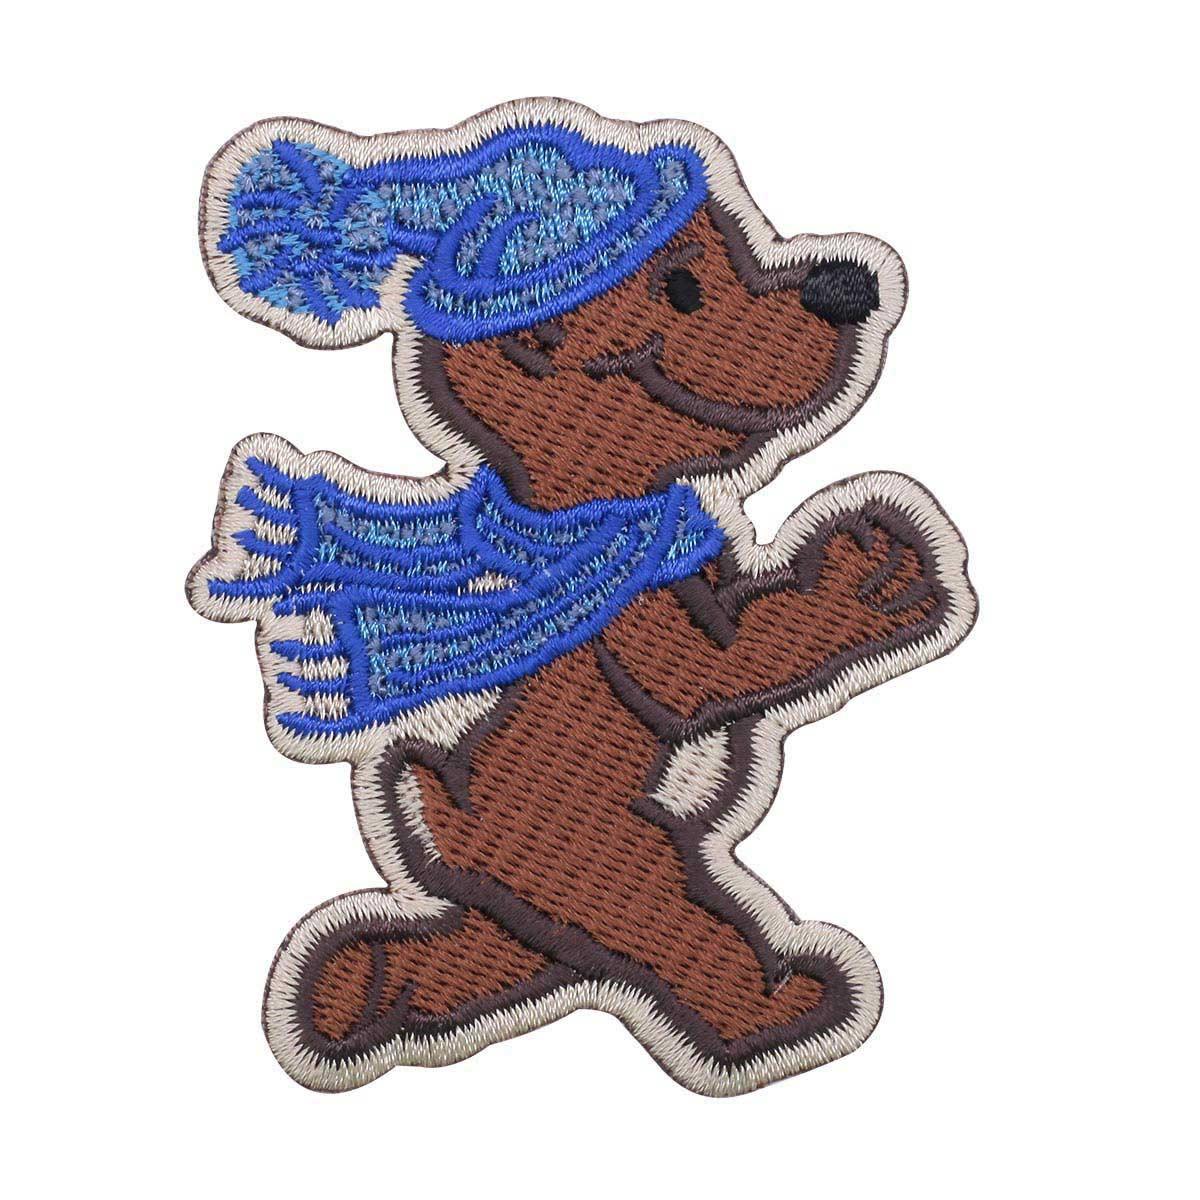 Термоаппликация 'Медвежонок в шарфике' 7,5*6см Hobby&Pro